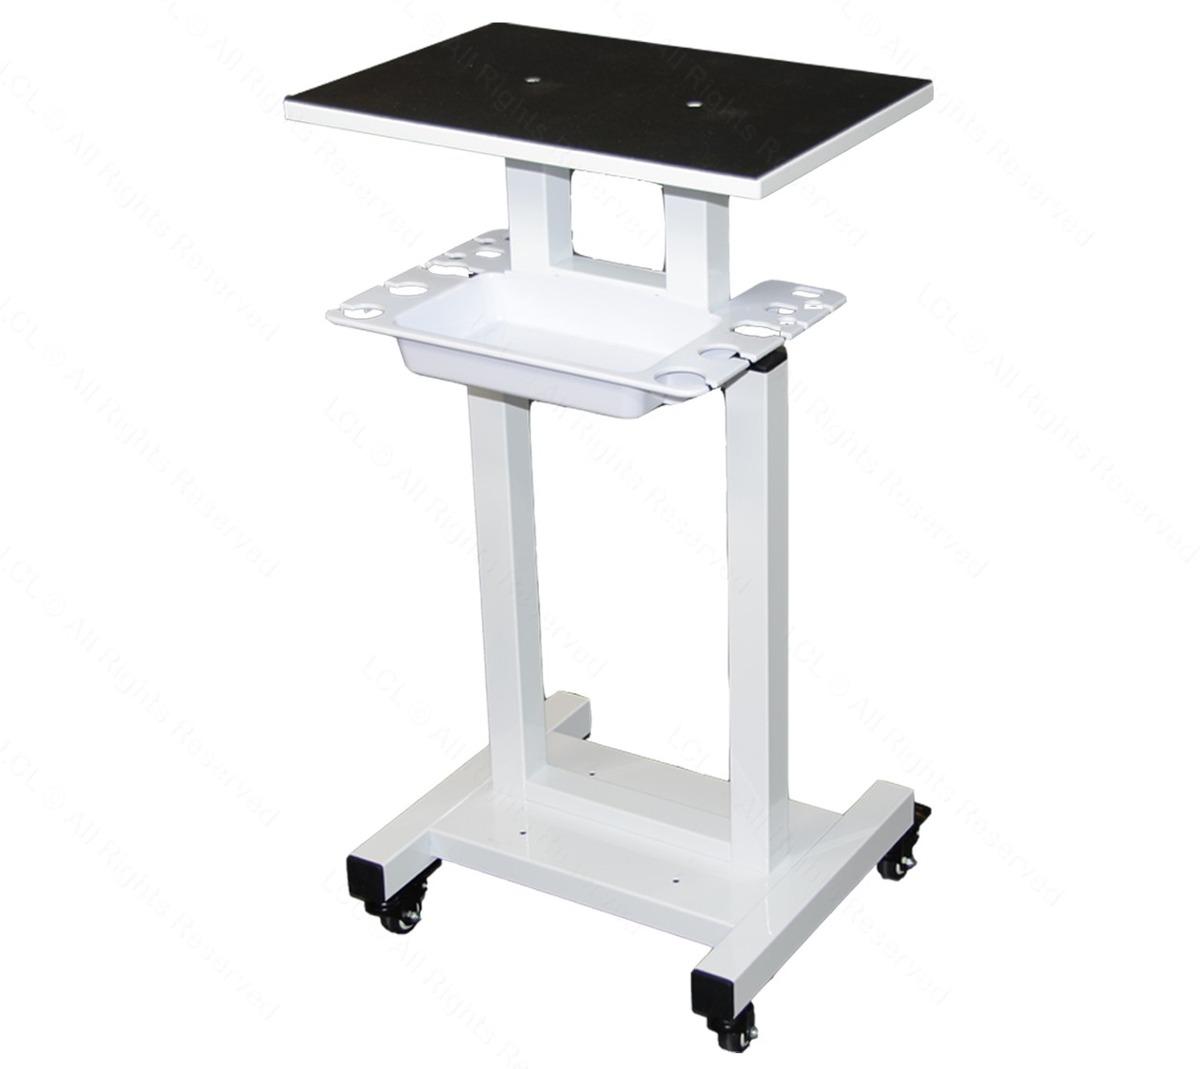 Económico Pedestal Mesa Con Ruedas Para Maquinas Spa, Salon - $ 4,770.00 en M...